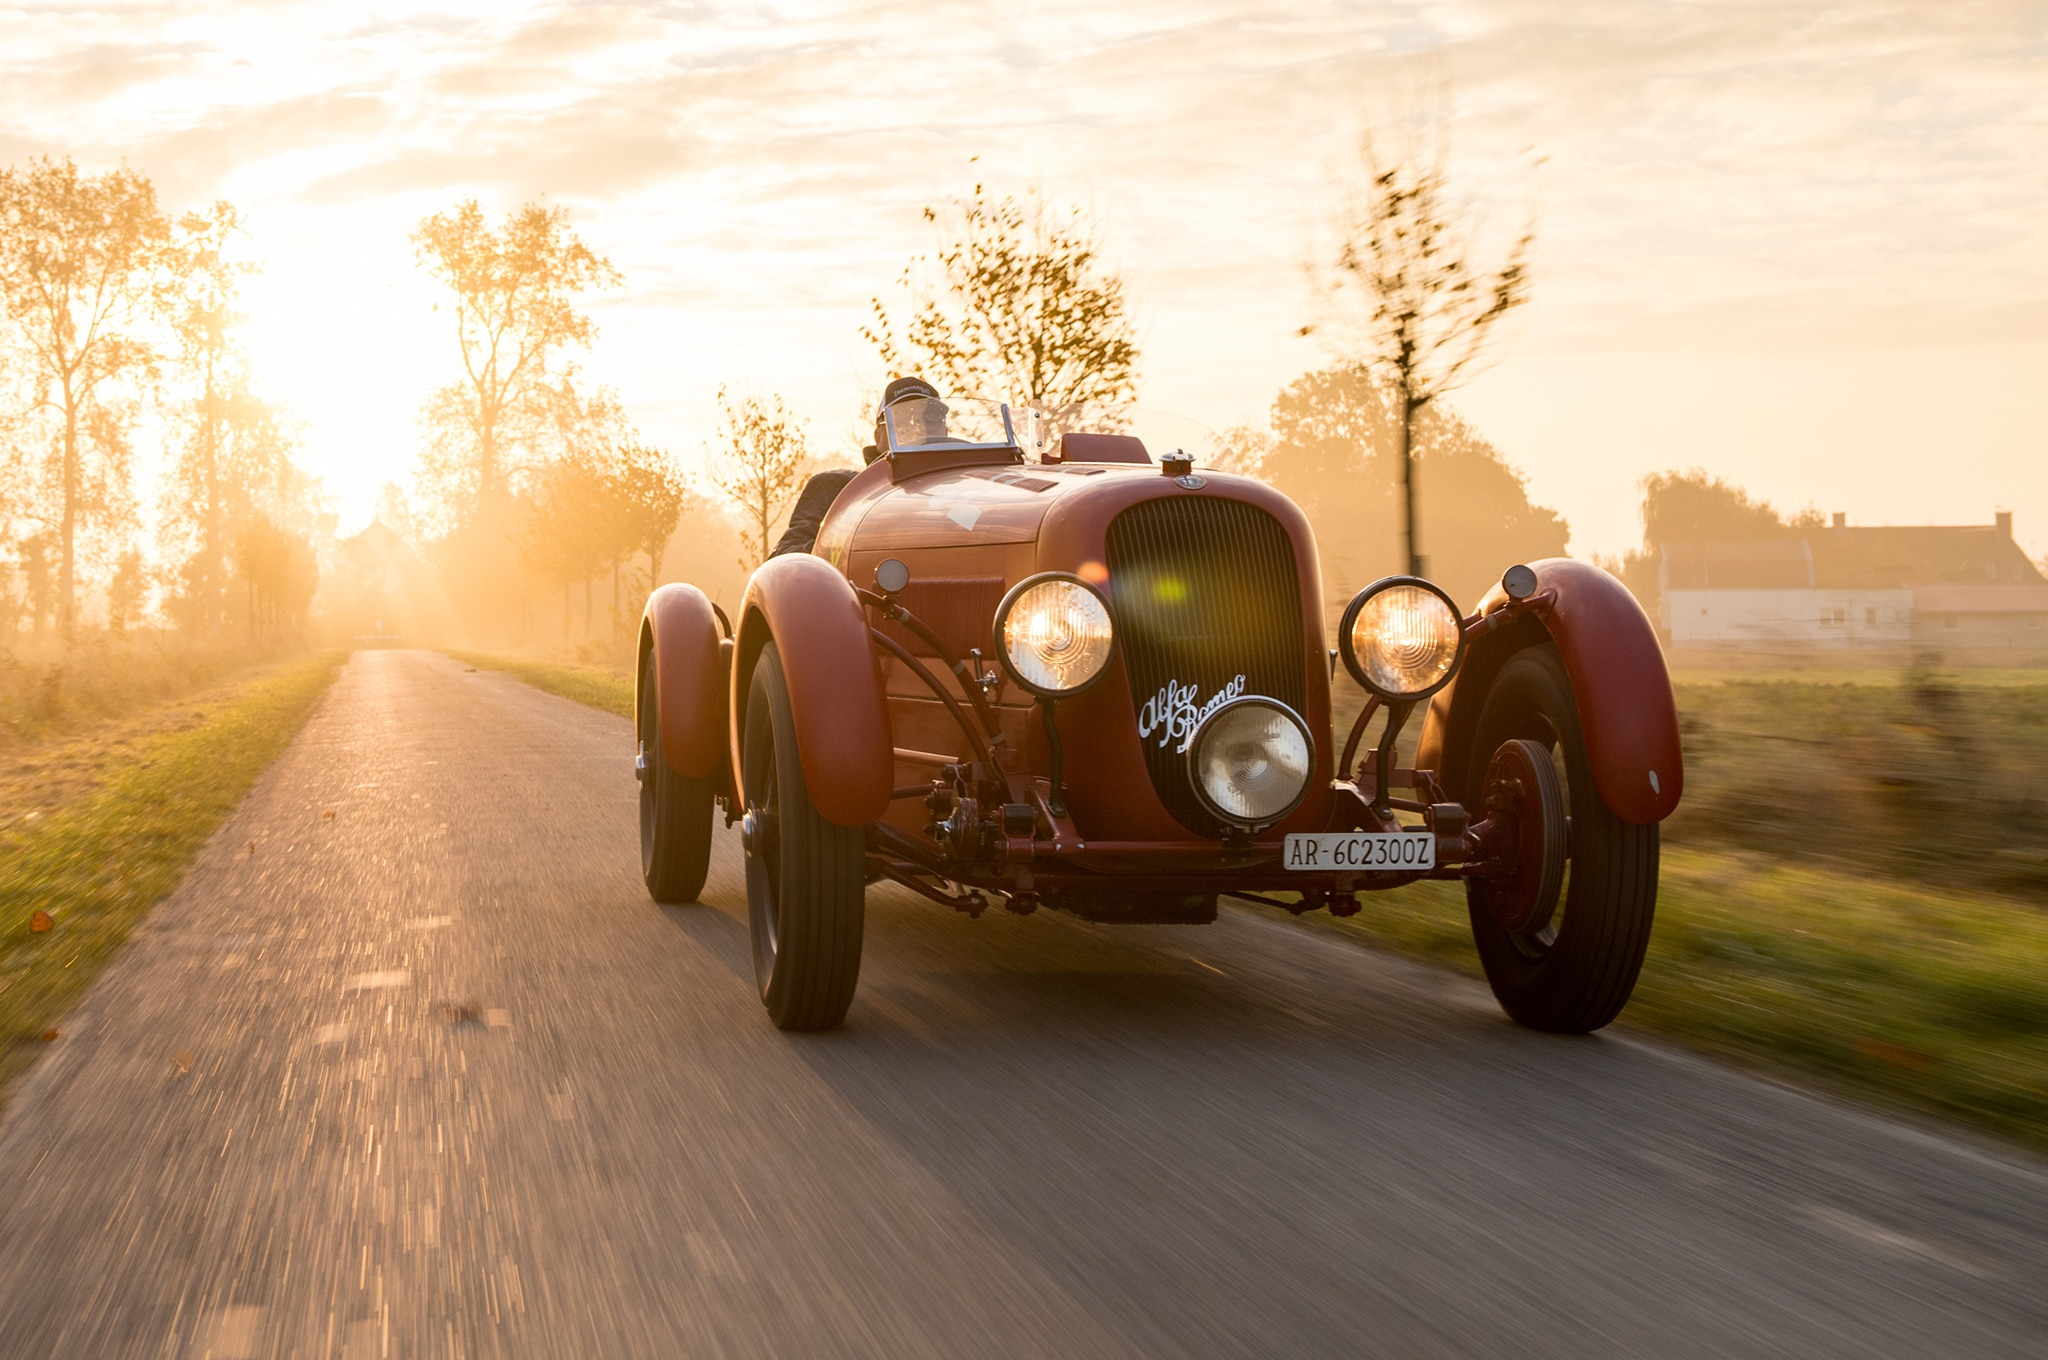 1934 Alfa Romeo 6C 2300 Pescara Spider Bonhams Front